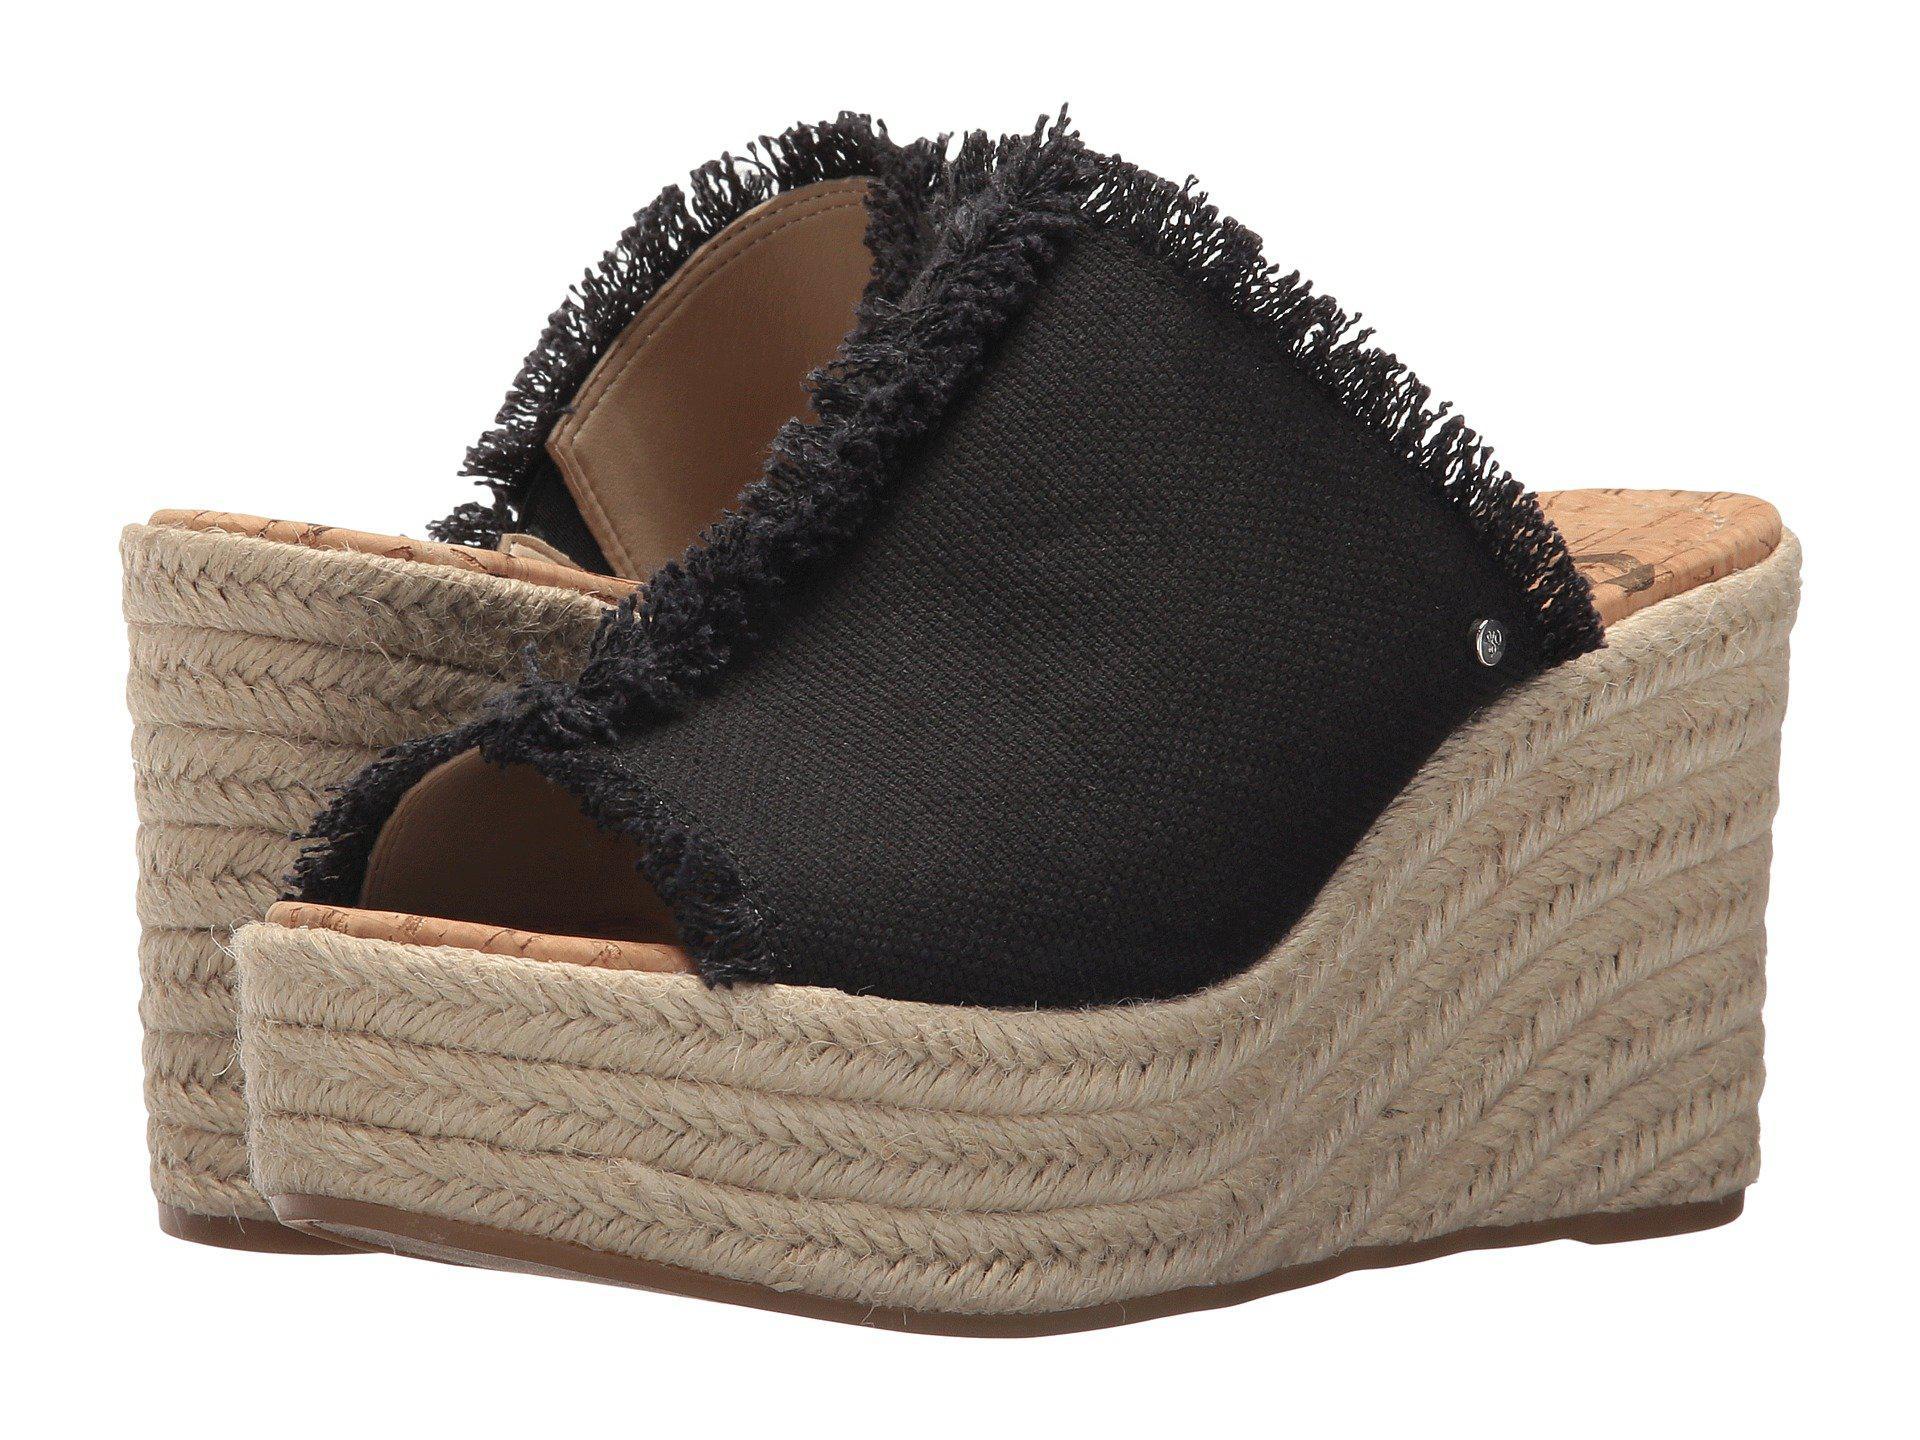 f81970d6279a82 Lyst - Sam Edelman Dina Espadrille Wedge Sandal in Black - Save 62%